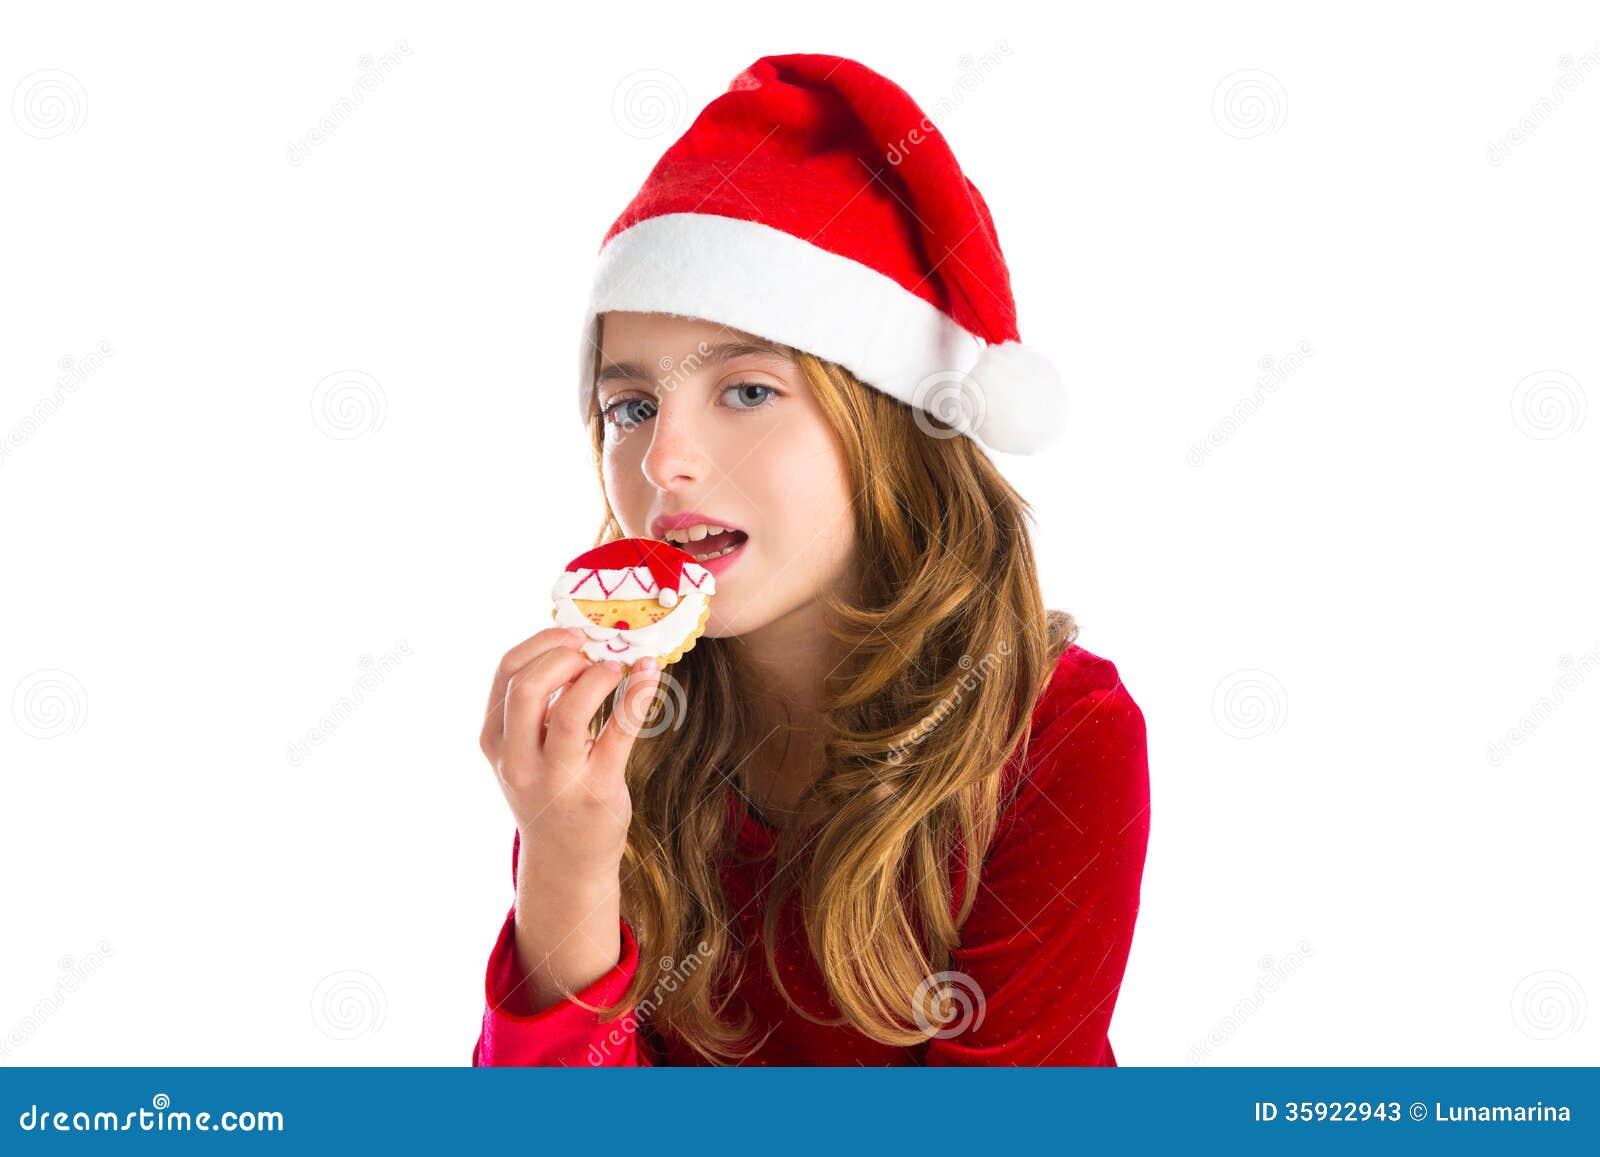 Christmas Kid Girl Eating Xmas Santa Cookie Stock Image - Image of ...